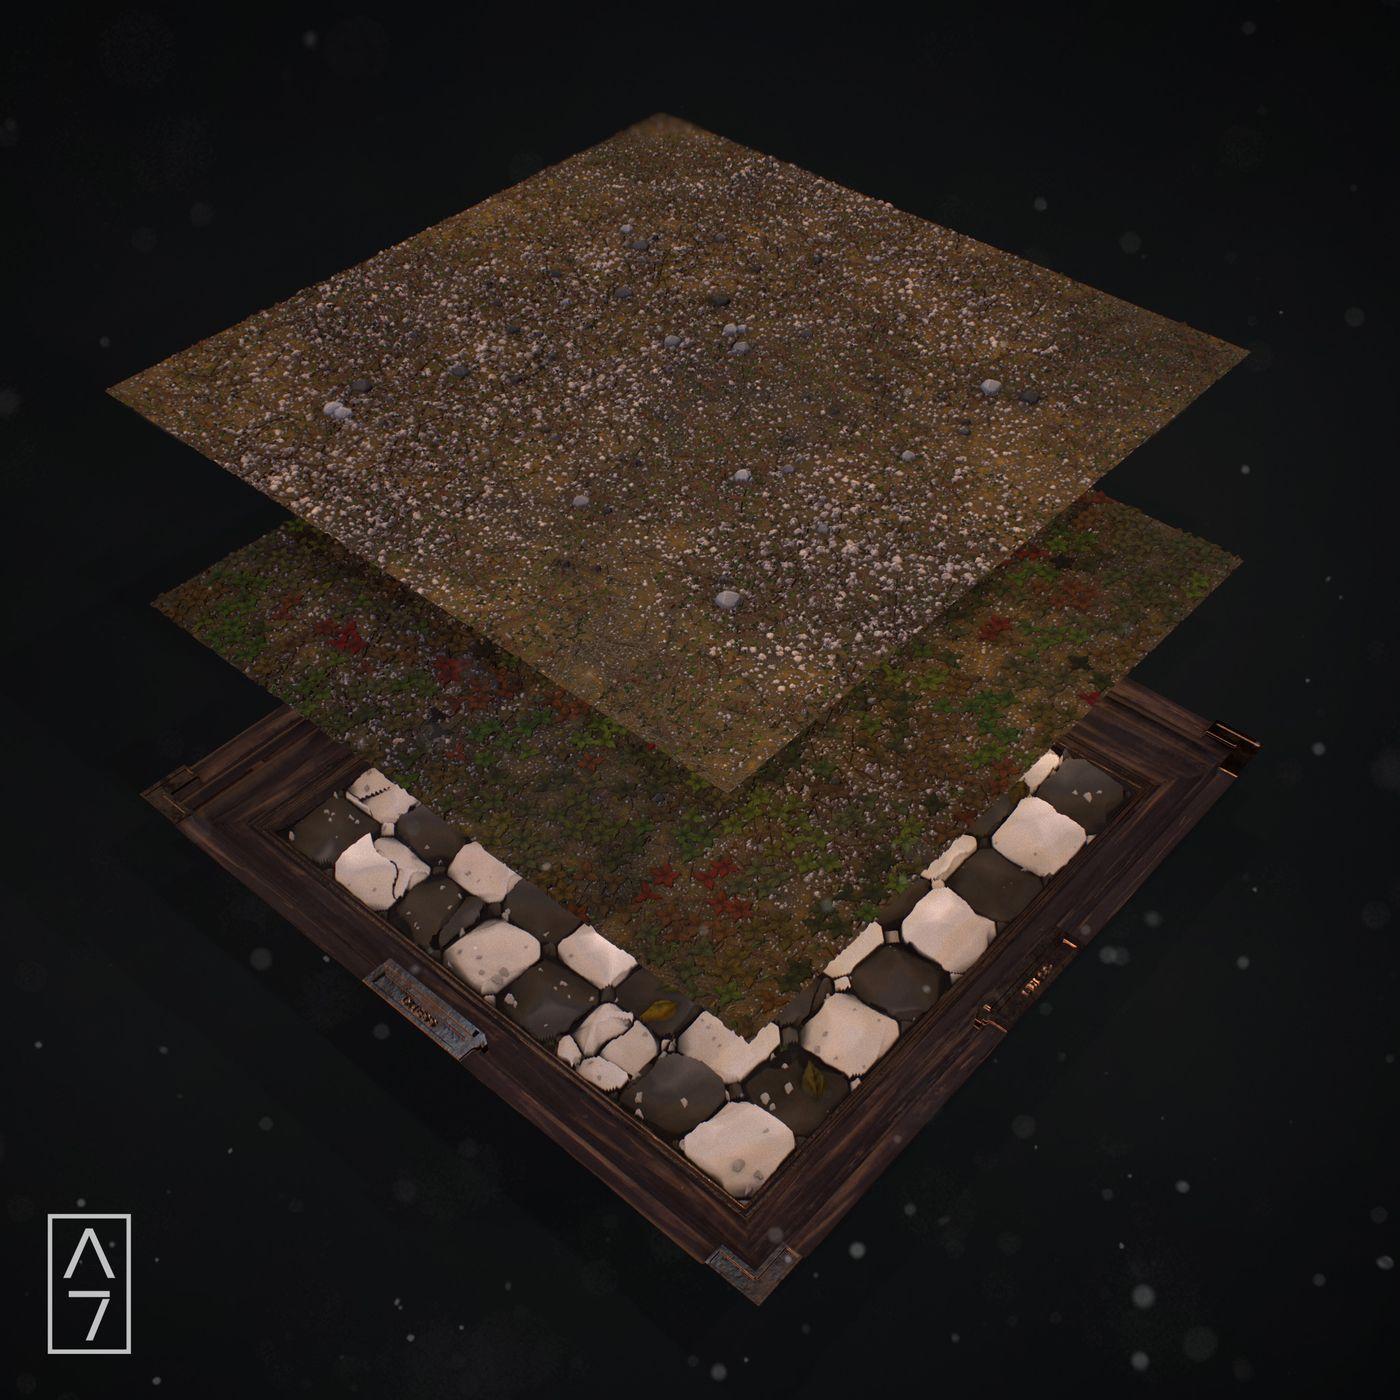 Chess Board Layers Arthurtasquin